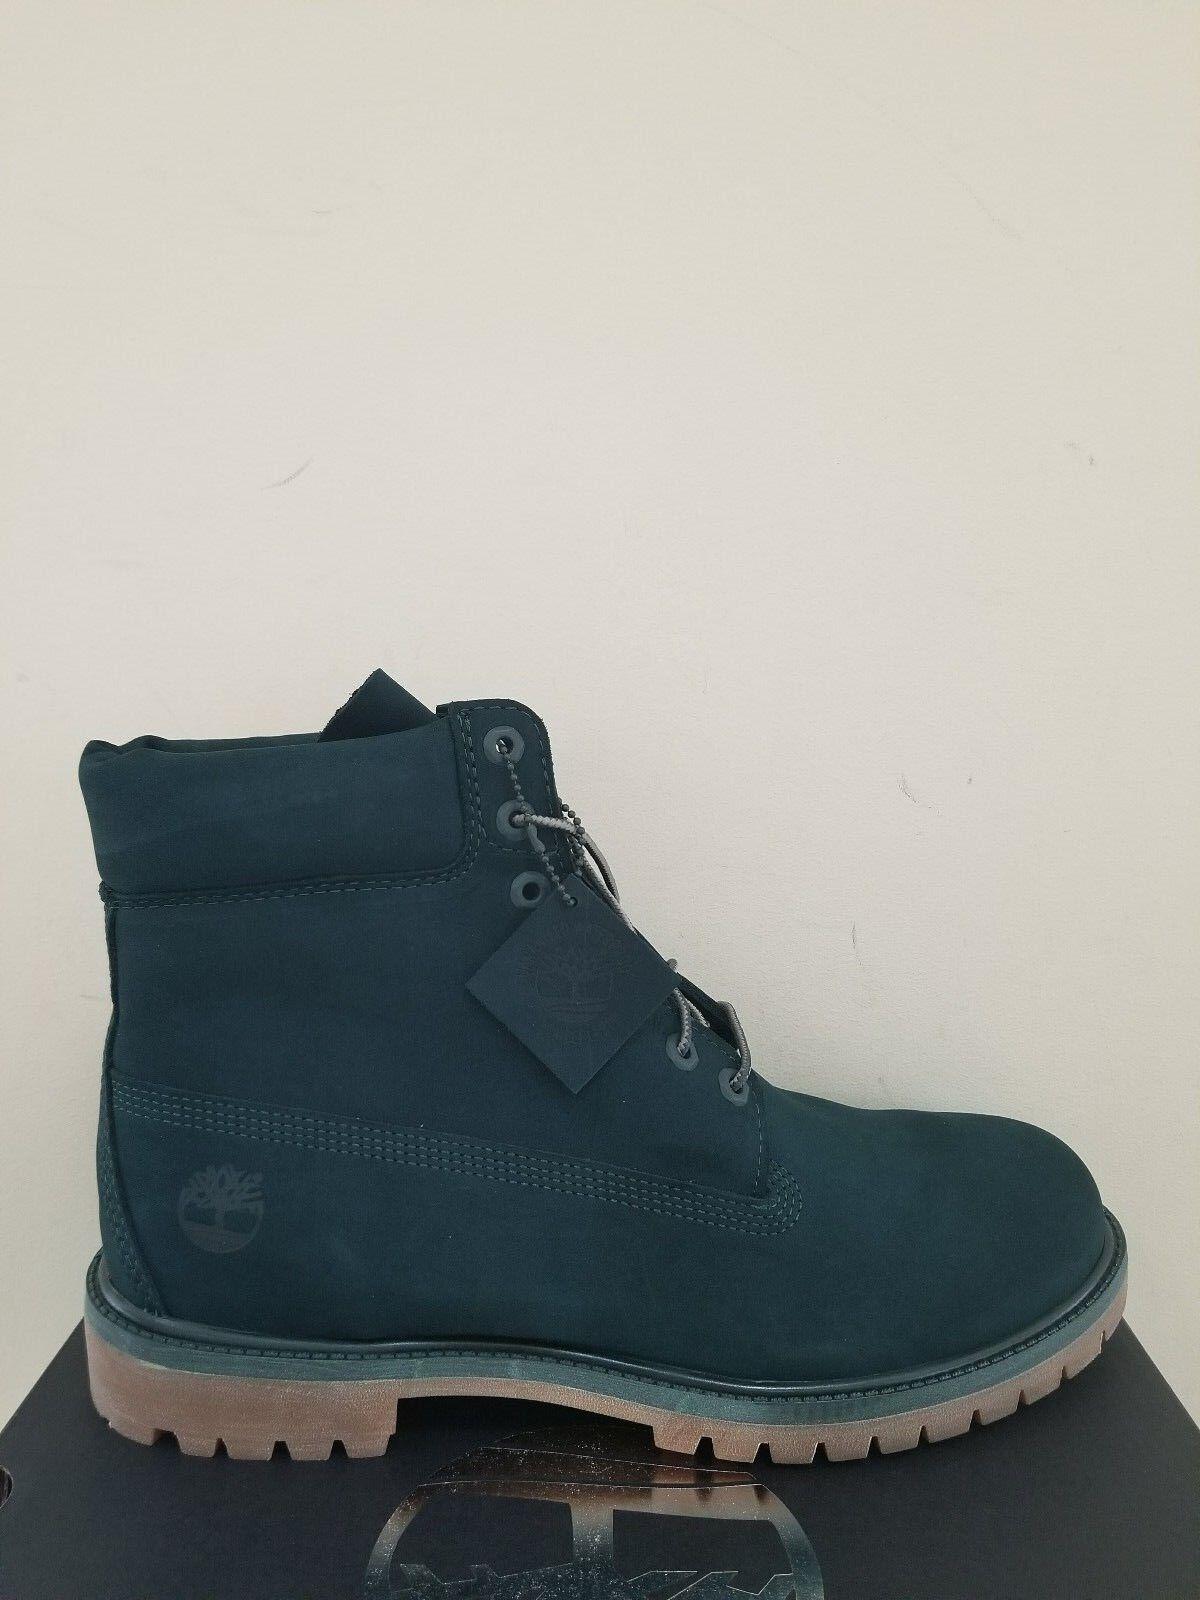 Timberland Men's 6-Inch Premium  Waterproof  Dark Green  Boots NIB